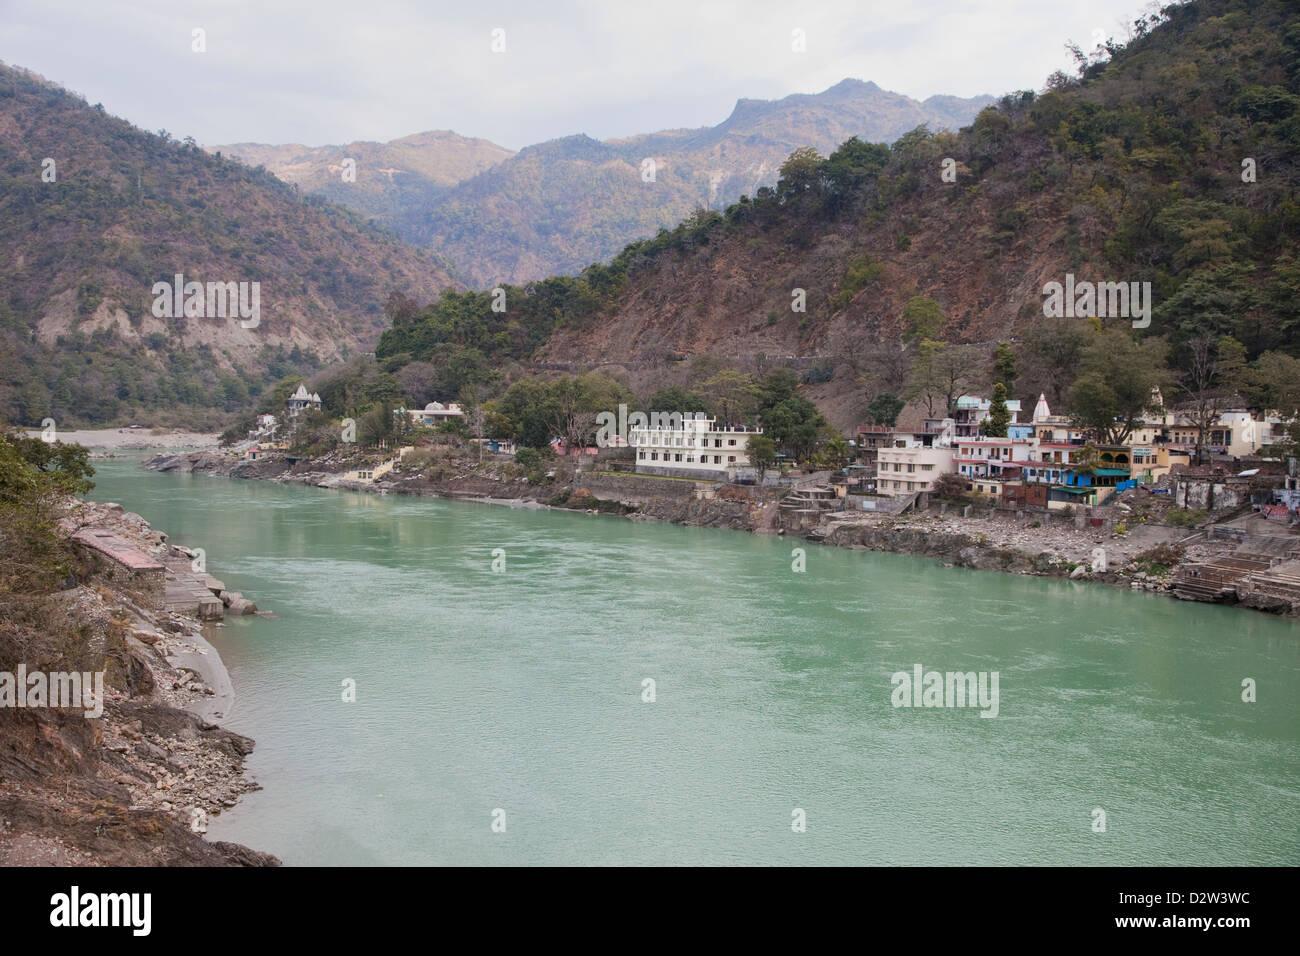 India, Rishikesh. Ganges (Ganga) River looking upstream toward the Himalayas. - Stock Image